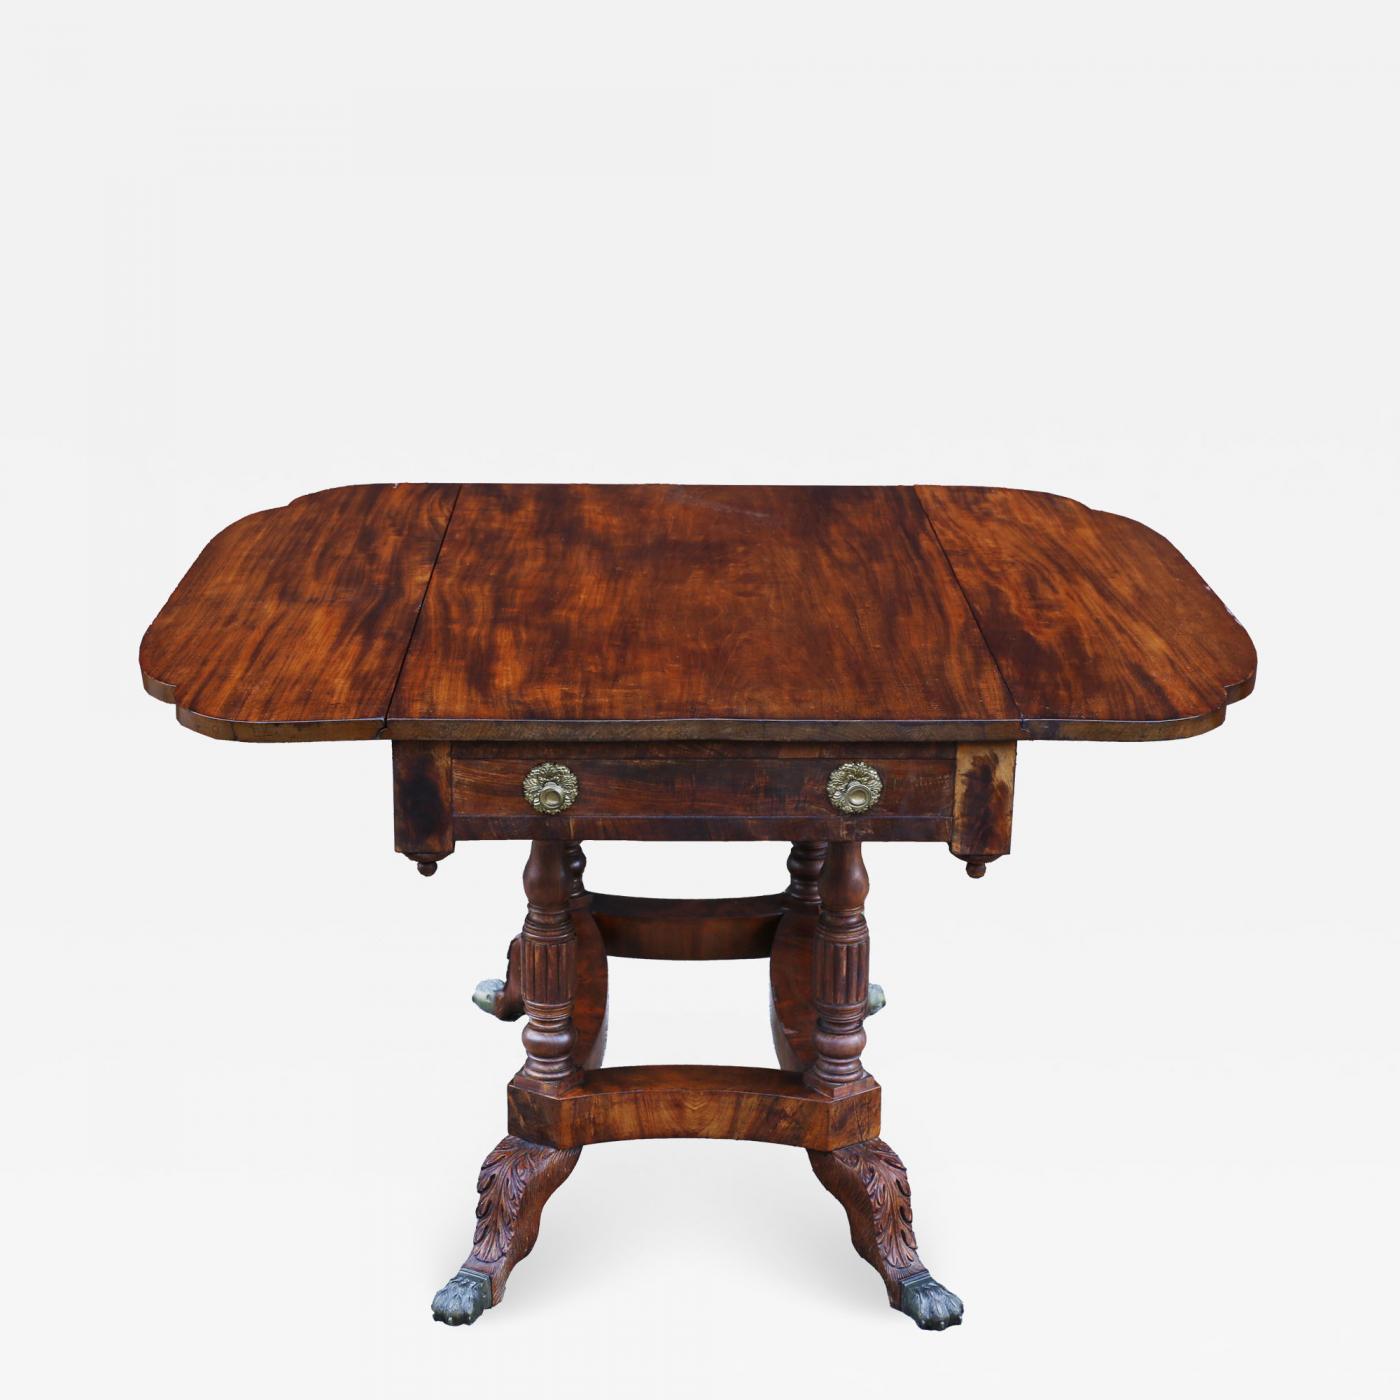 Early 19th Century American Federal Mahogany Drop Leaf Table